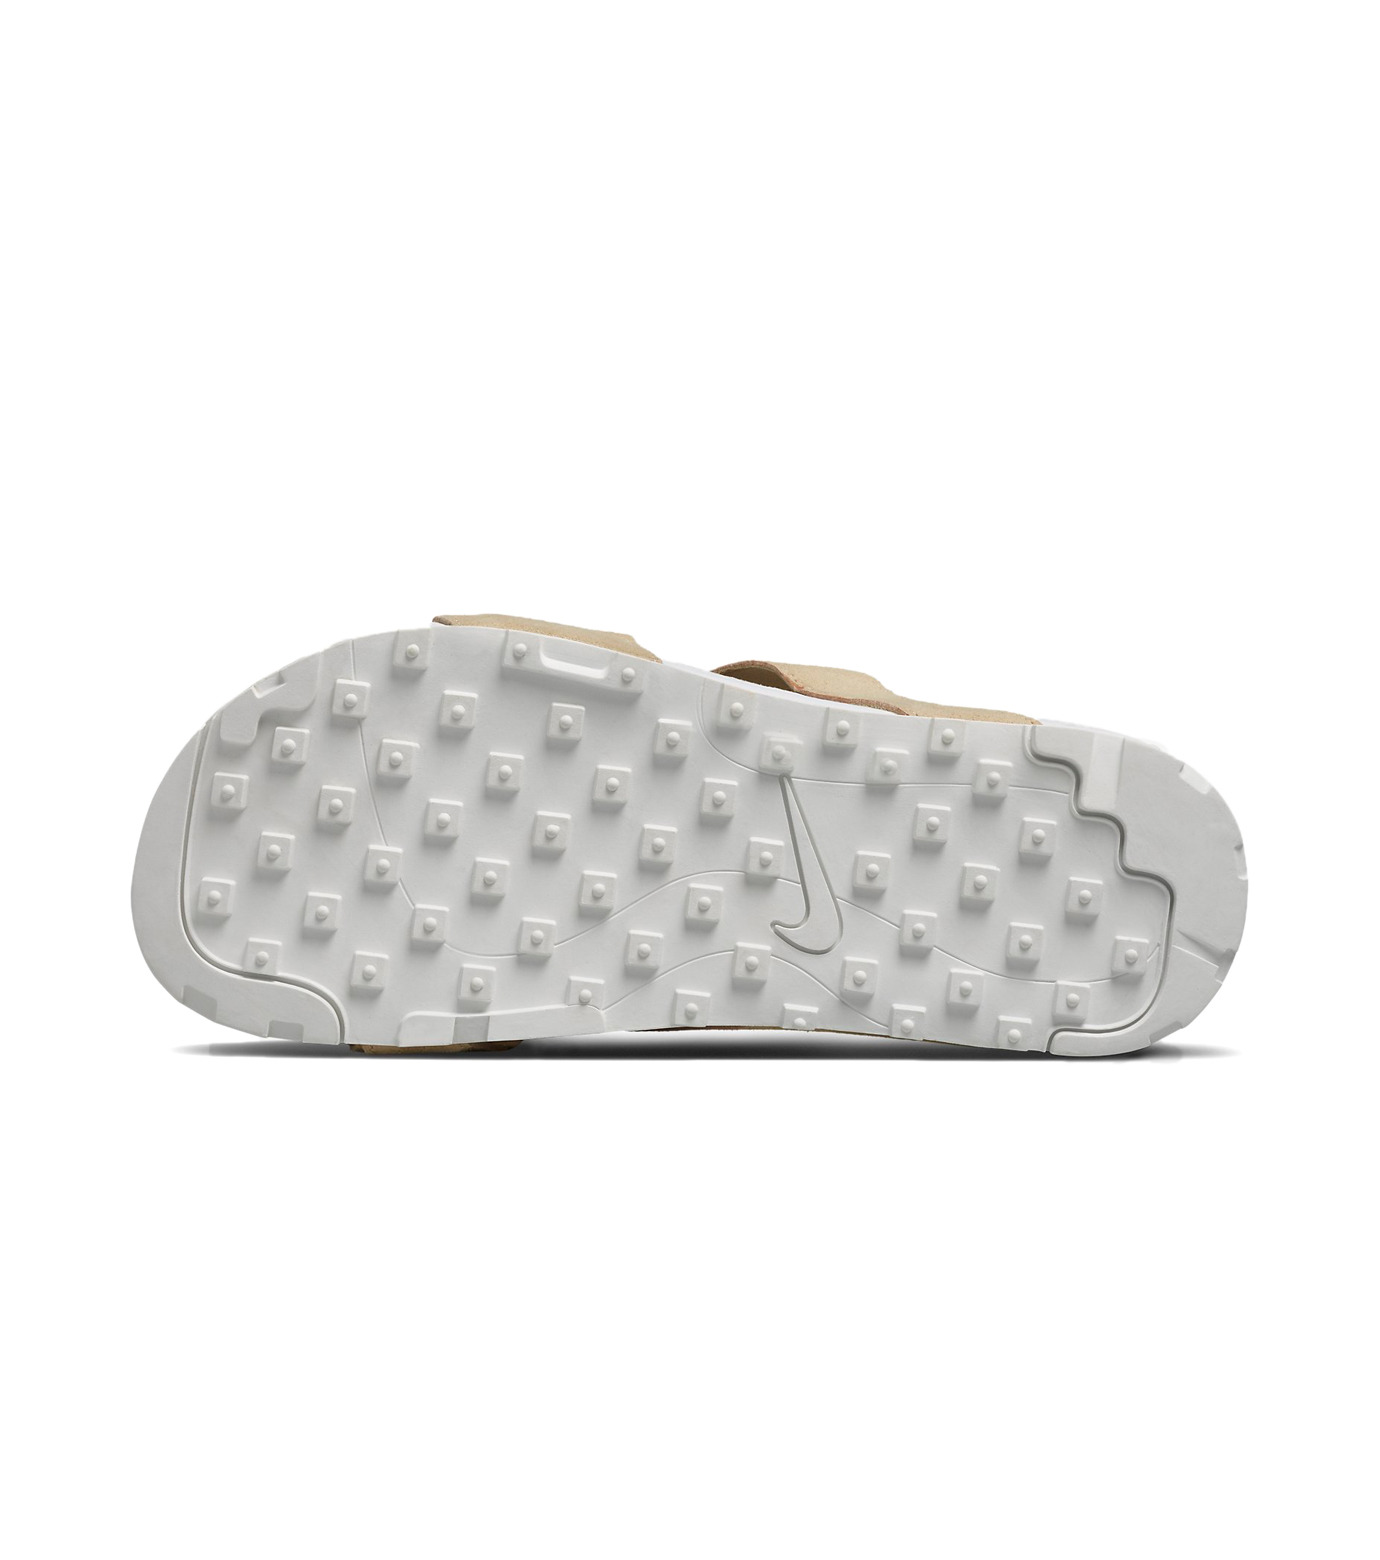 NIKE(ナイキ)のTAUPO-BEIGE(シューズ/shoes)-849756-210-52 拡大詳細画像2